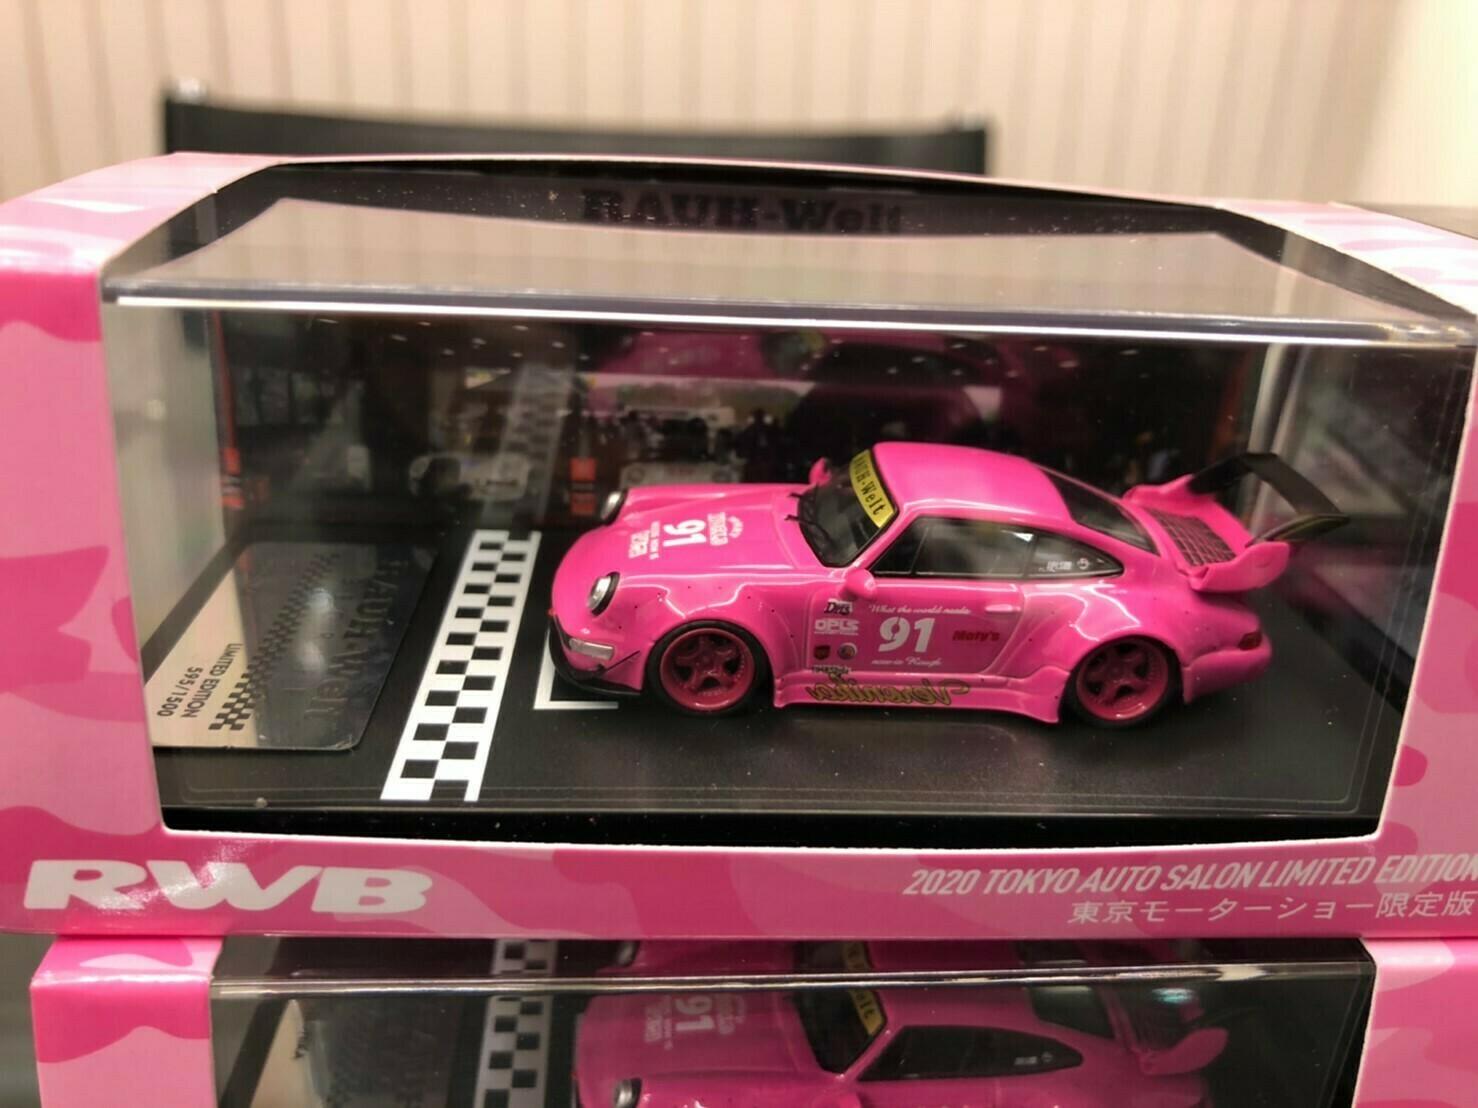 RWB 1/64 model car idlers (Pink) 2020 Tokyo Auto Salon Limited Edition